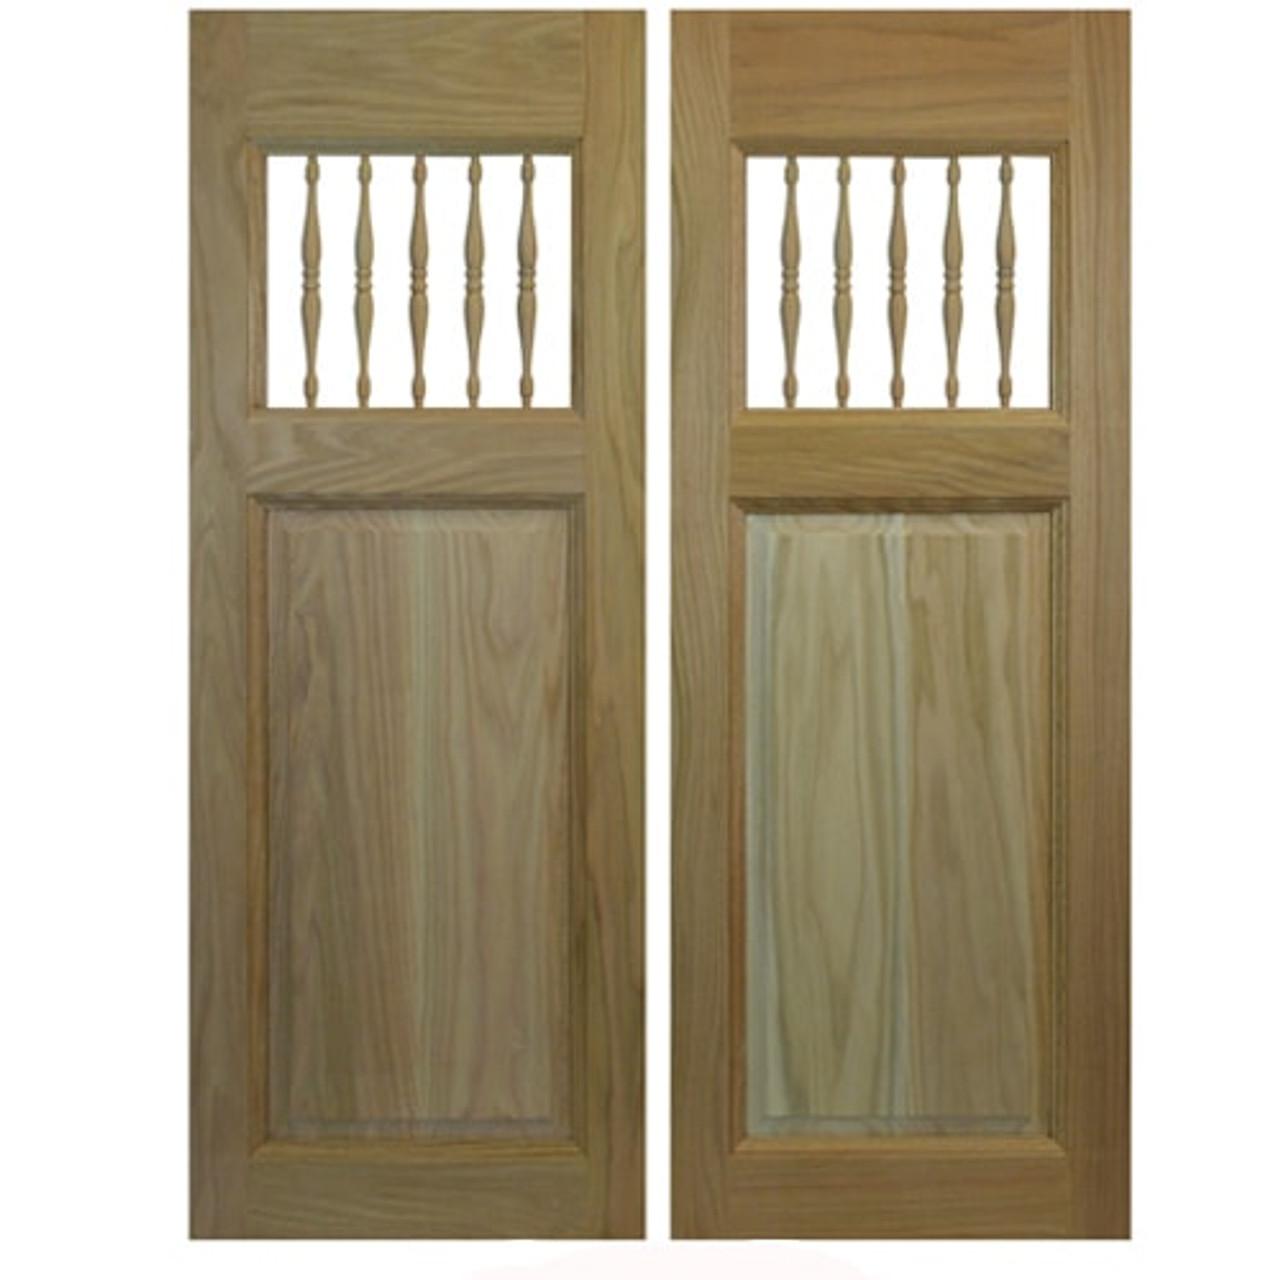 Commercial Grade Spindles Western Saloon Doors